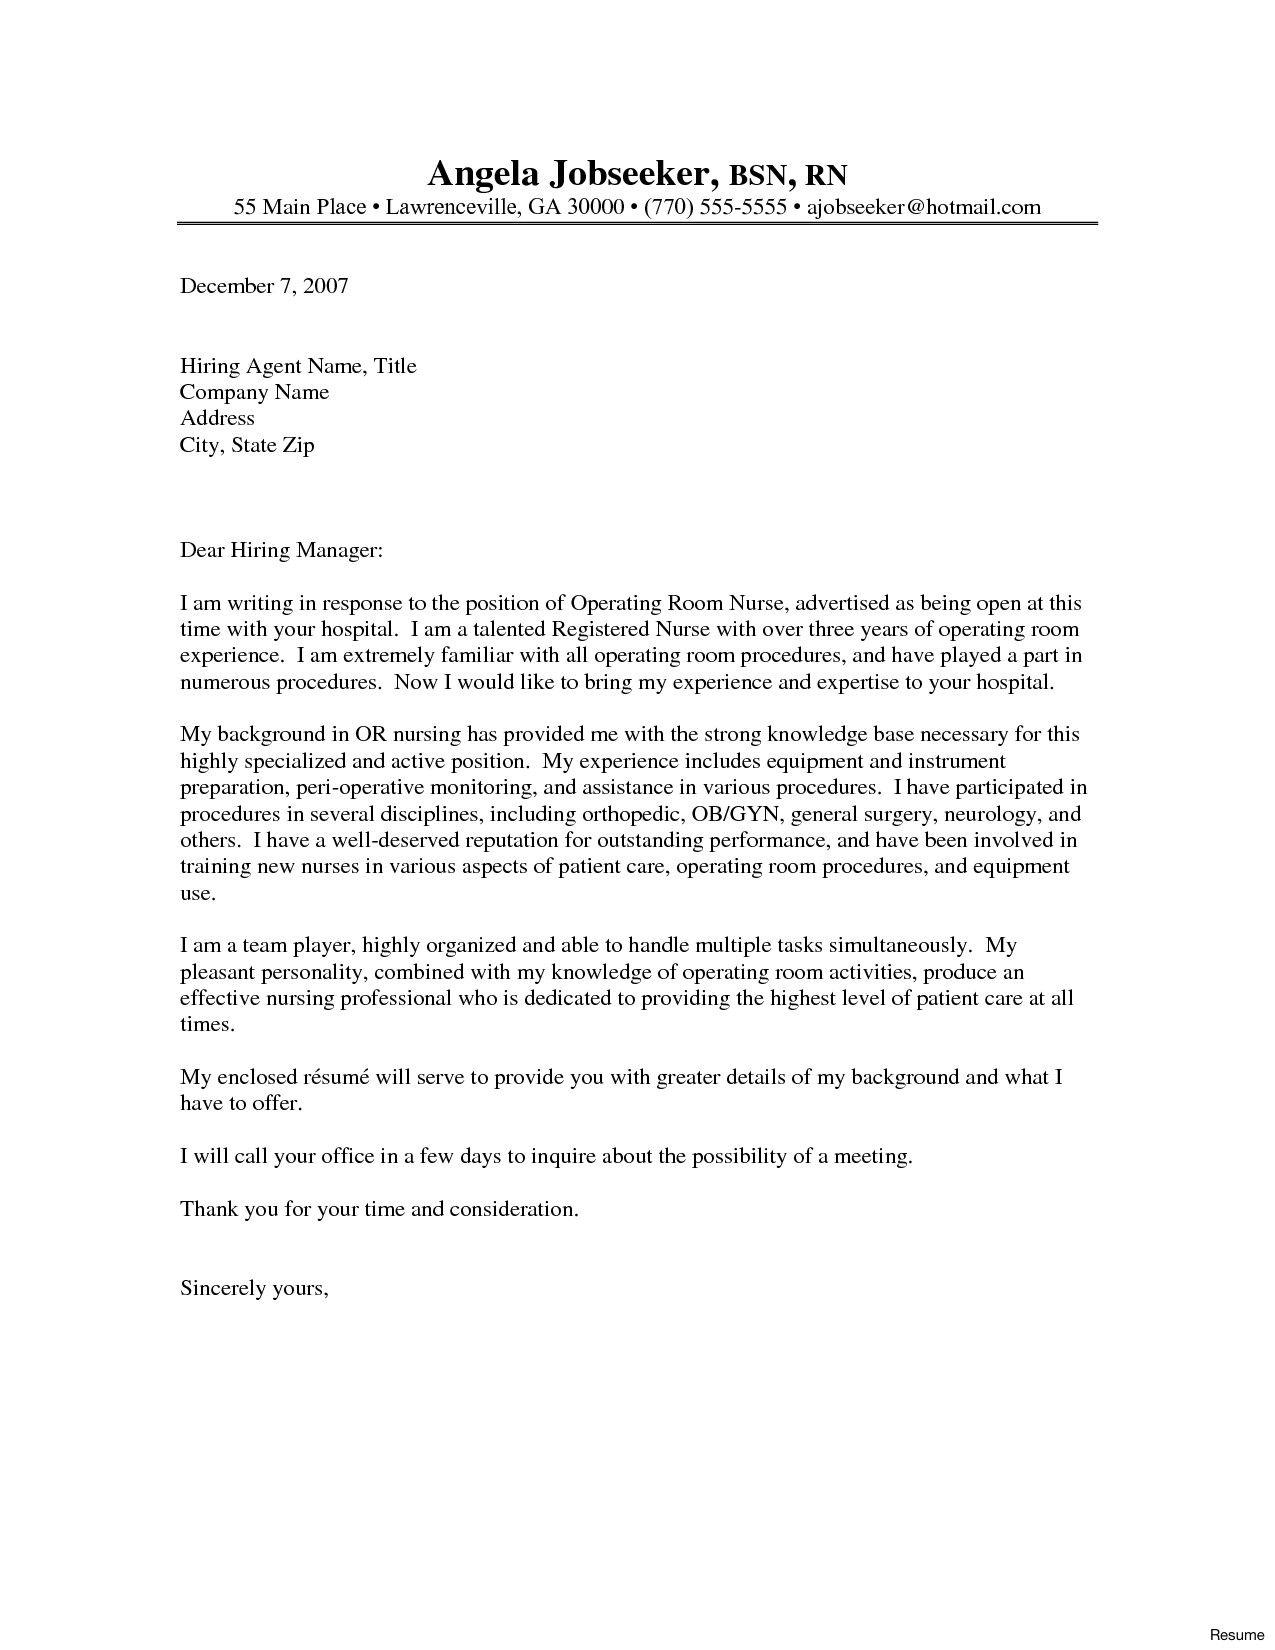 Find Fantastic Sample Resume Cover Letter For Nurses  That Wow